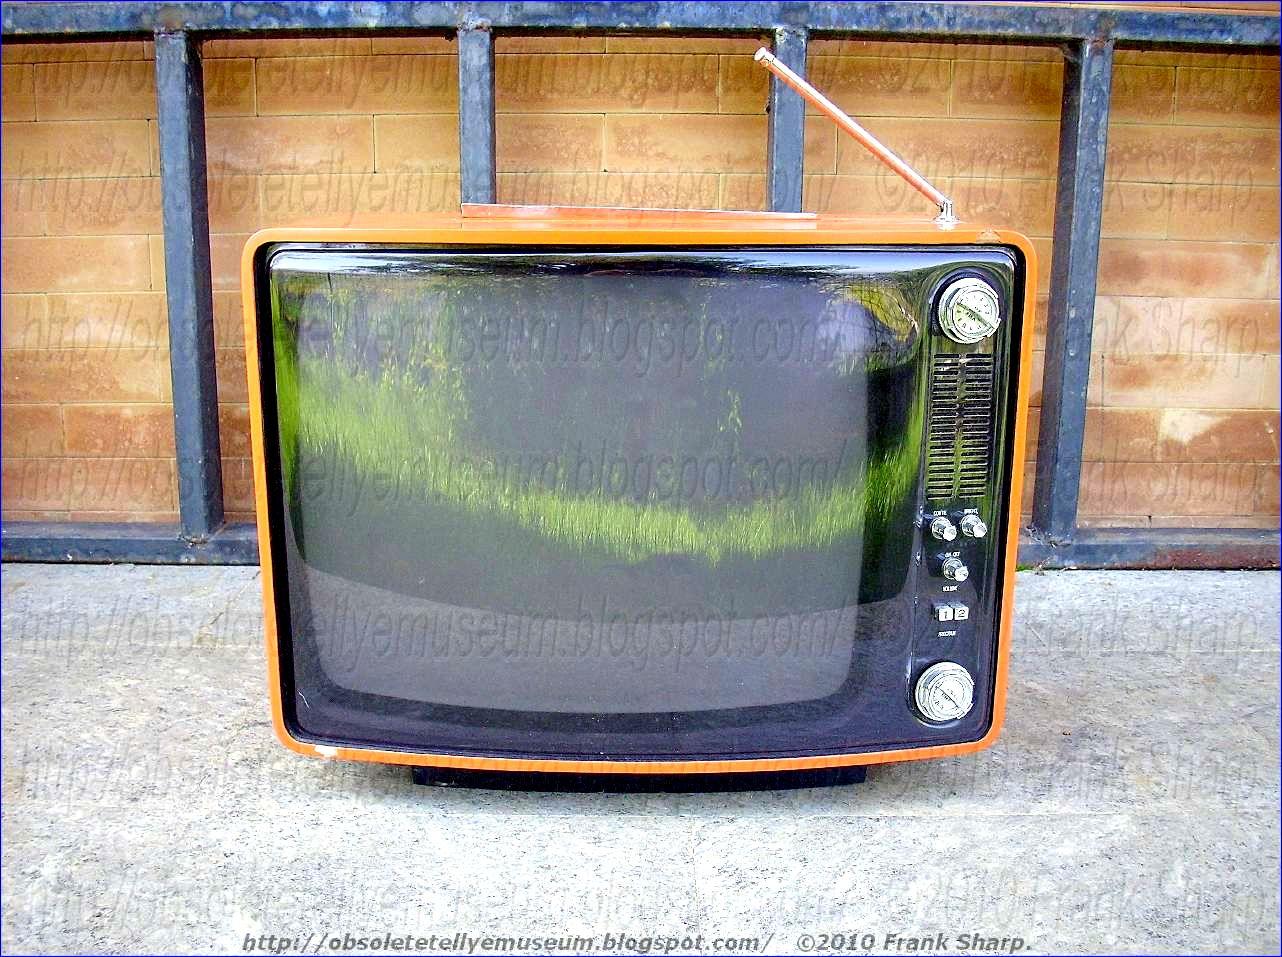 Best Of Emerson Flat Screen Tv Problems